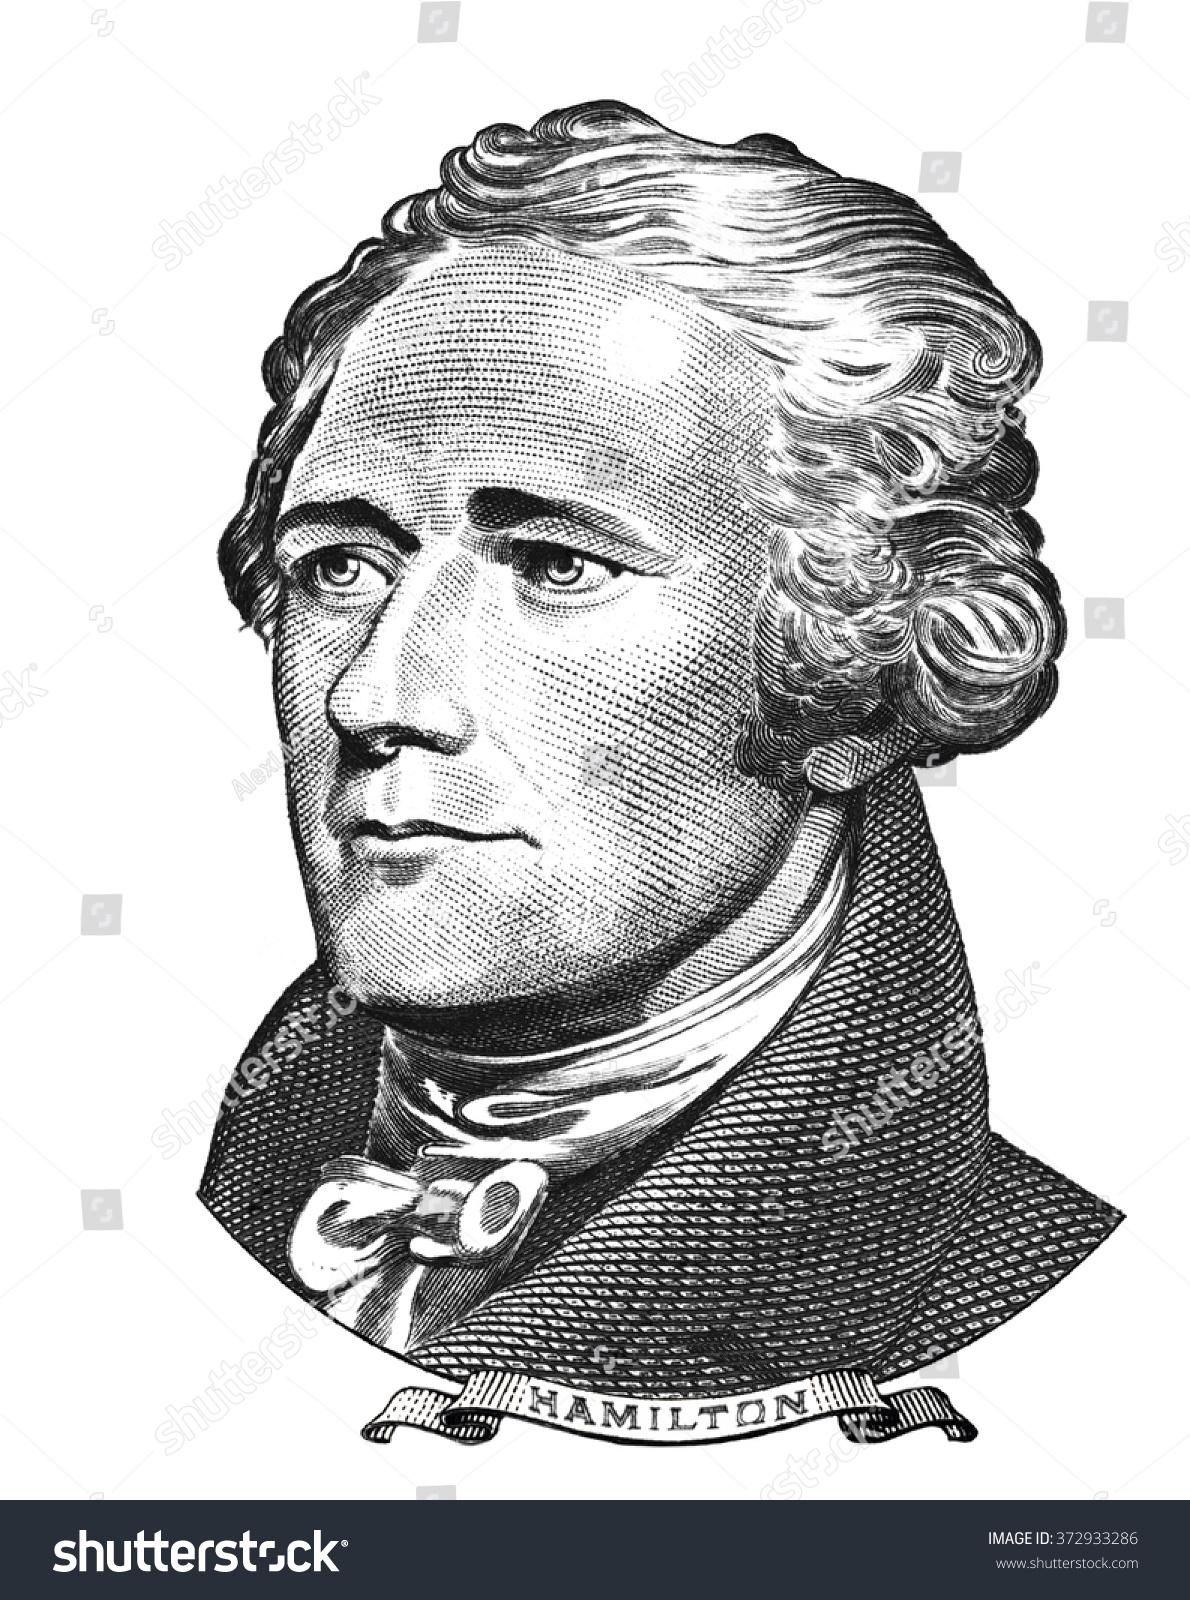 Portrait of alexander hamilton isolated on white background